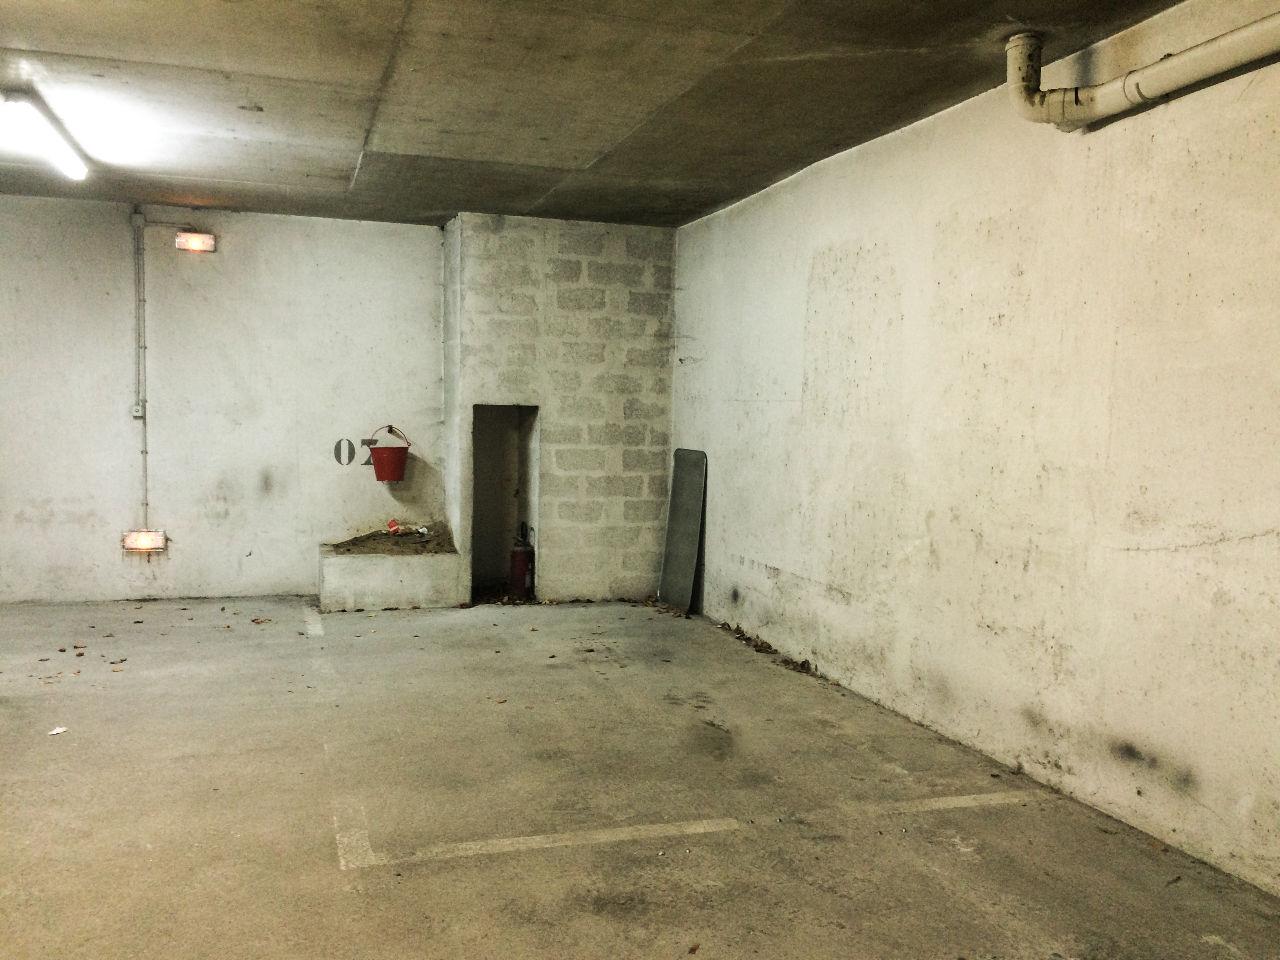 Vente garage parking paris popincourt 11e arrondissement for Garage mercedes paris 17 rue cardinet